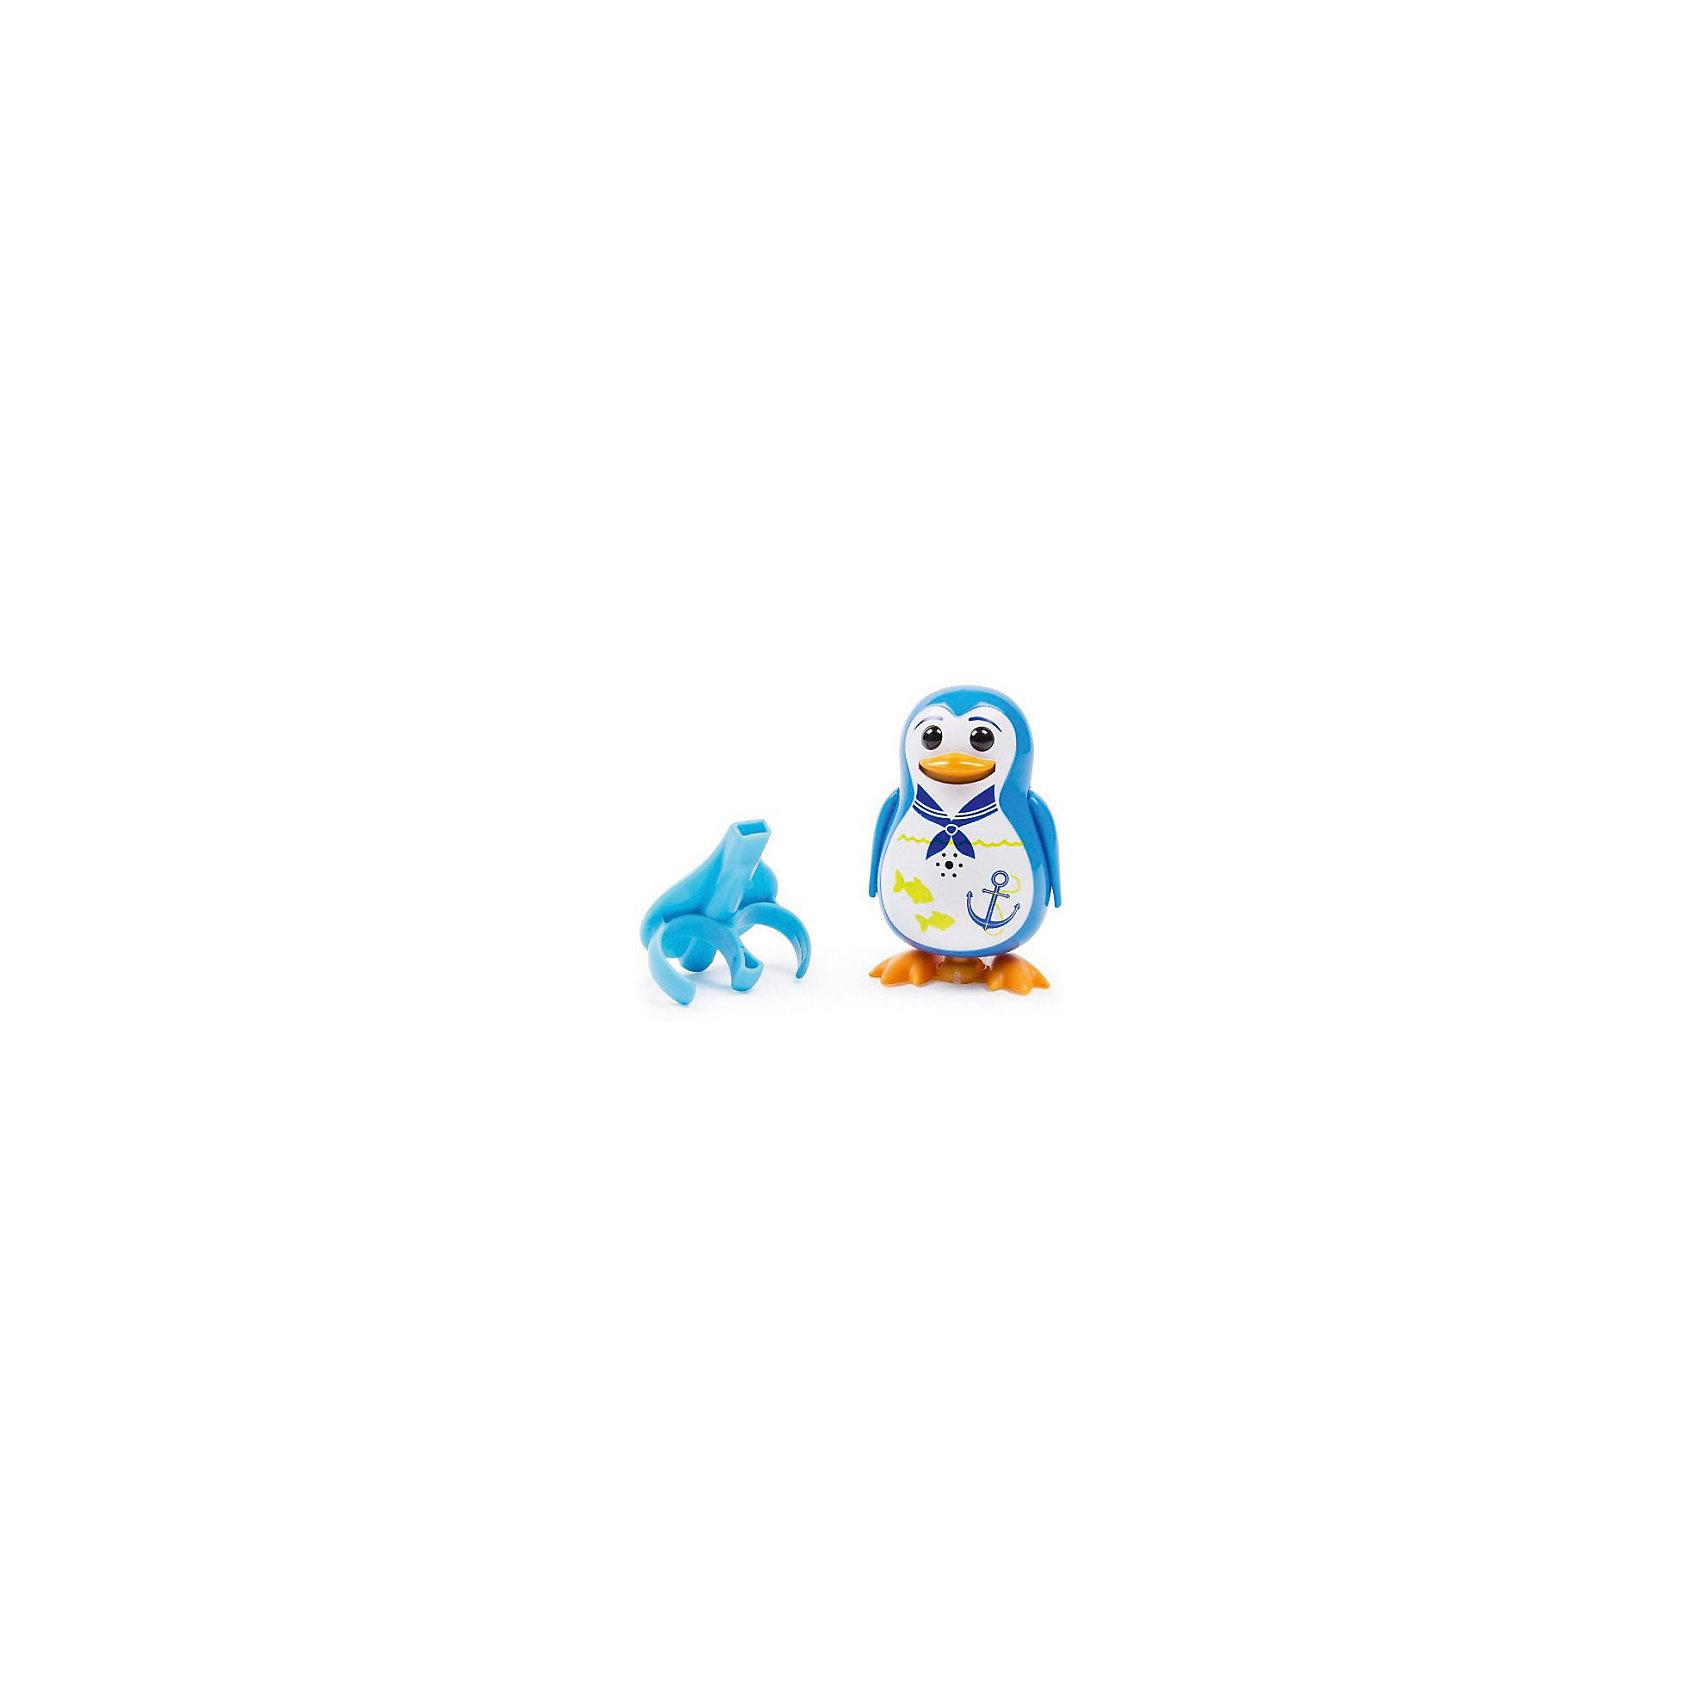 Silverlit Поющий пингвин с кольцом, синий, DigiBirds silverlit поющий пингвин с кольцом черный digibirds